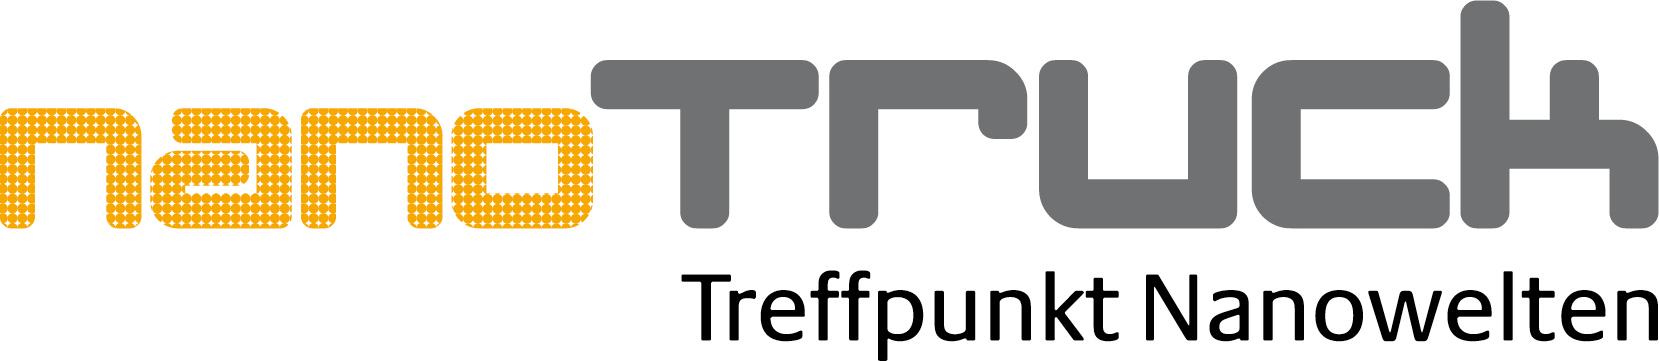 NT-Logo_Nanowelten_RGB_140mm.jpg